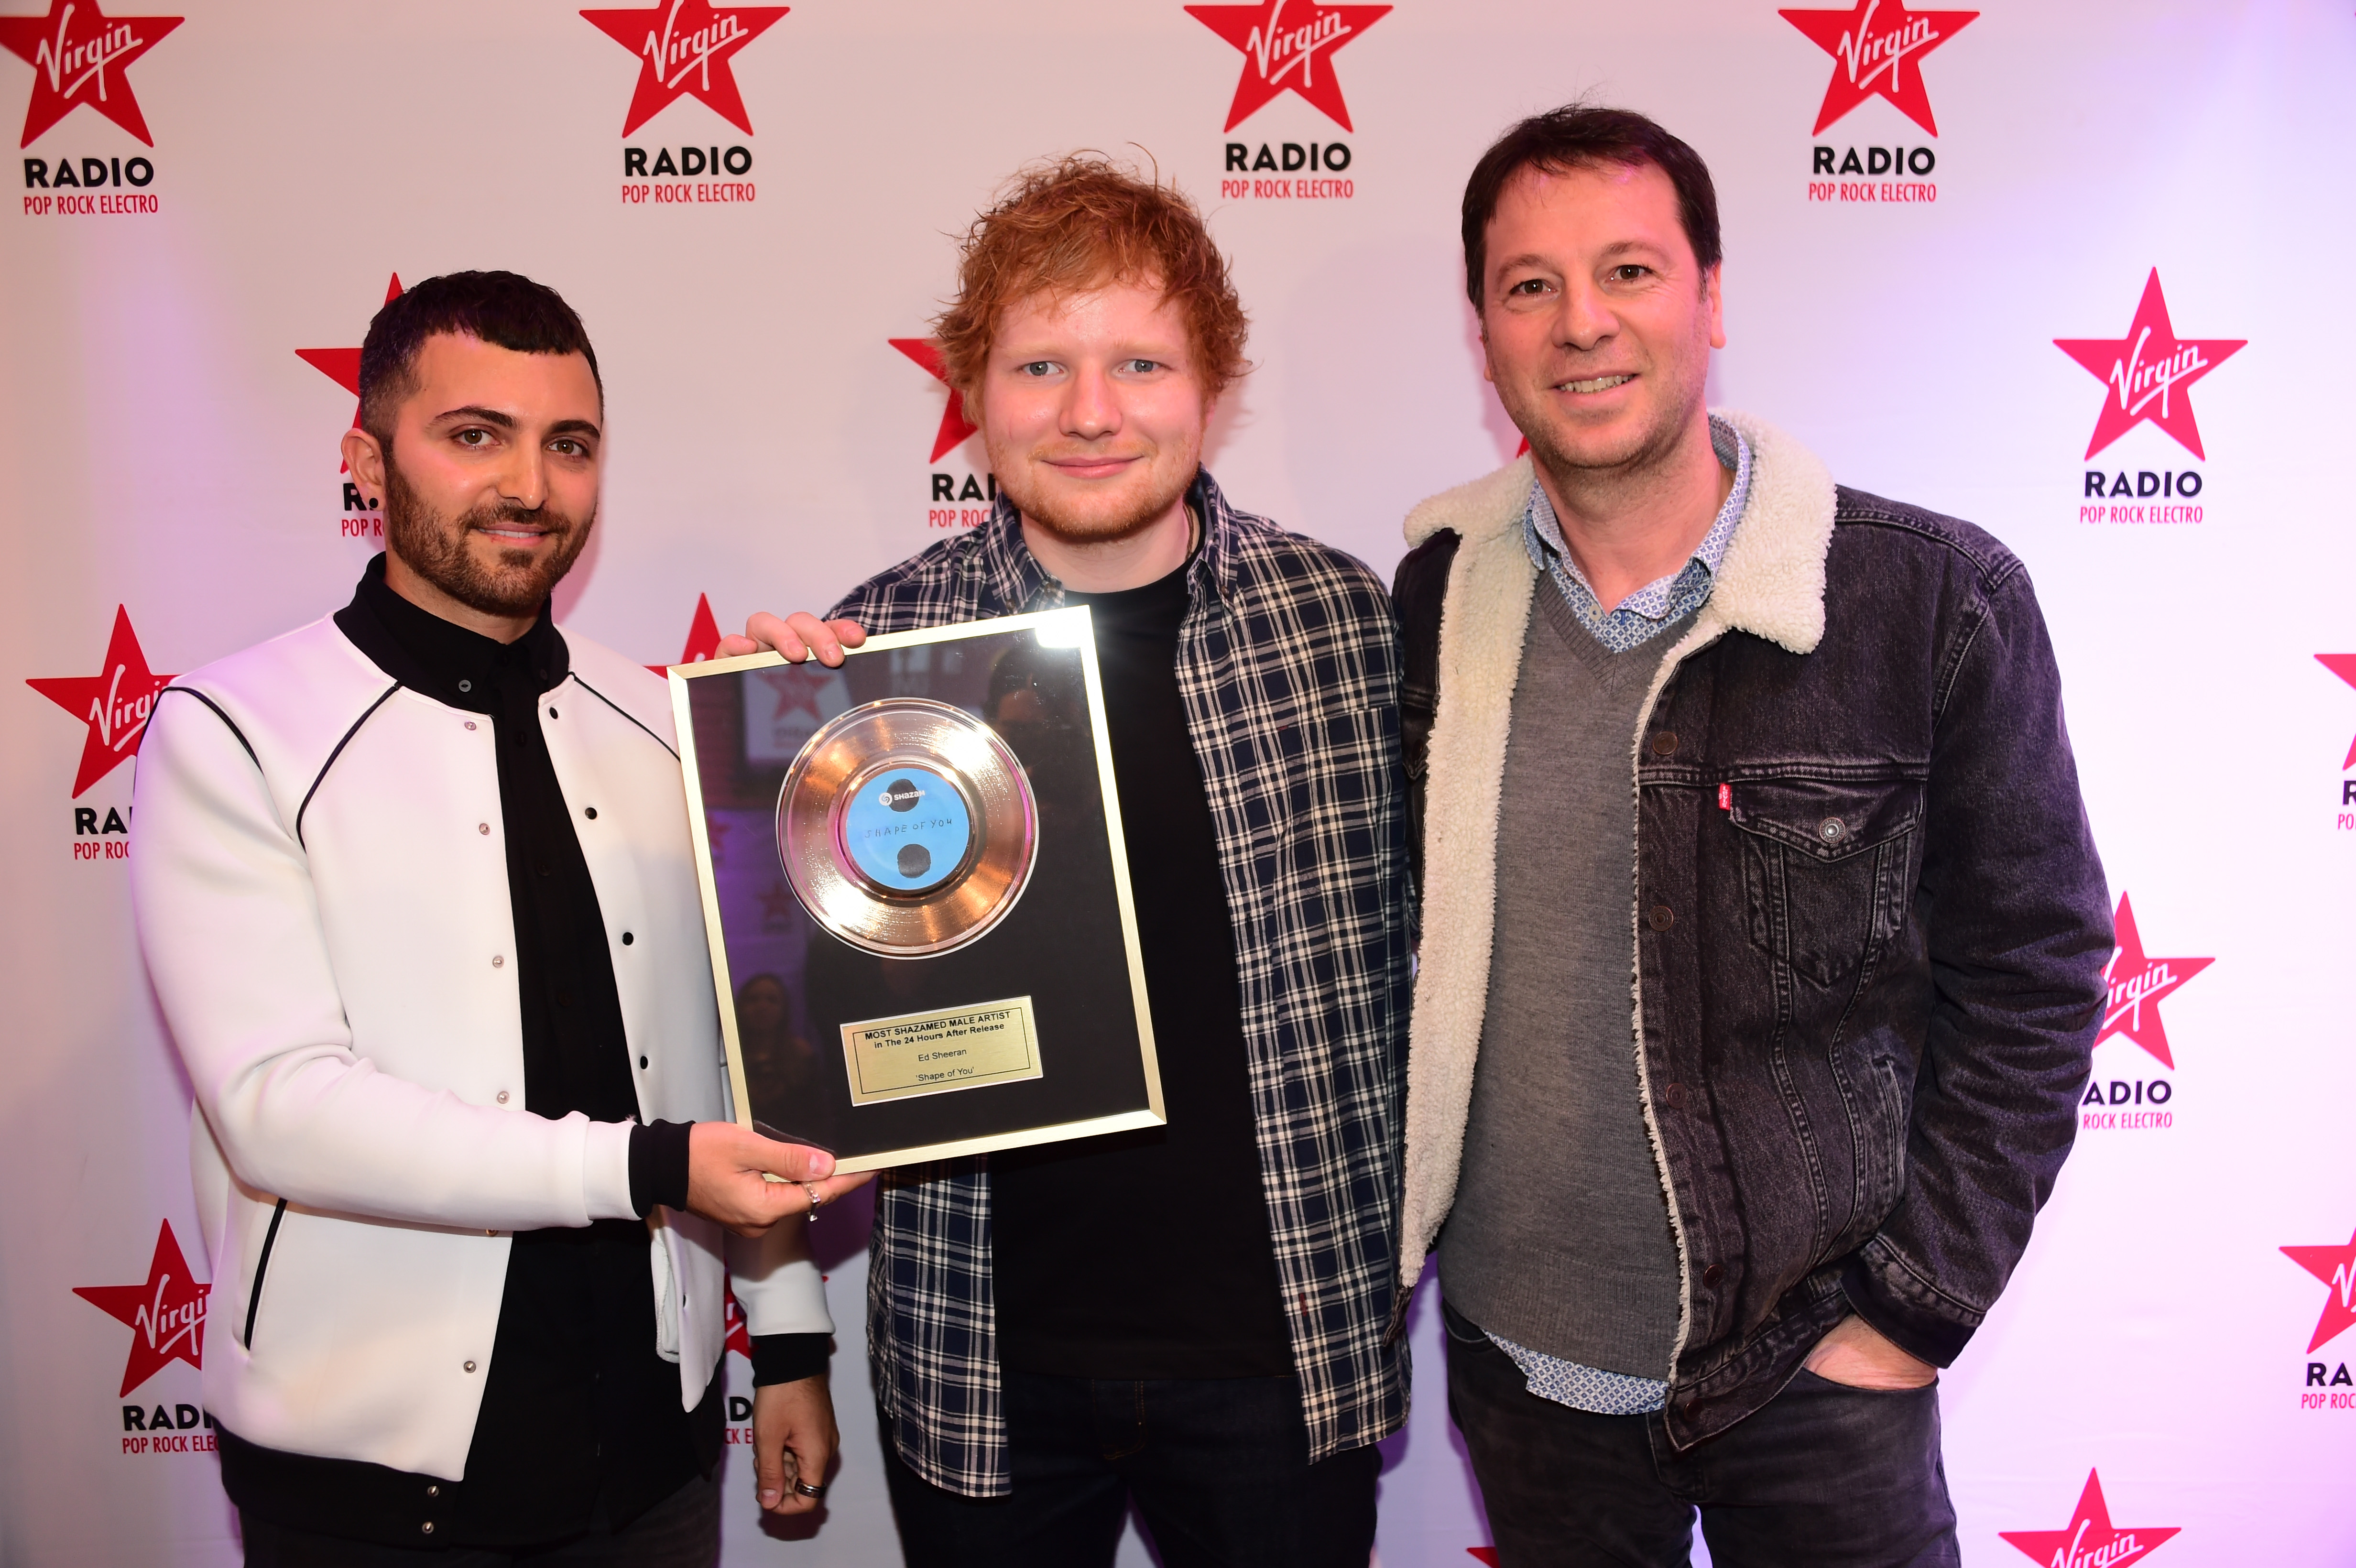 Ed Sheeran entouré de Giovanni Bossio (Shazam) et Roberto Ciurleo (Virgin Radio) © AnthonyGhnassia